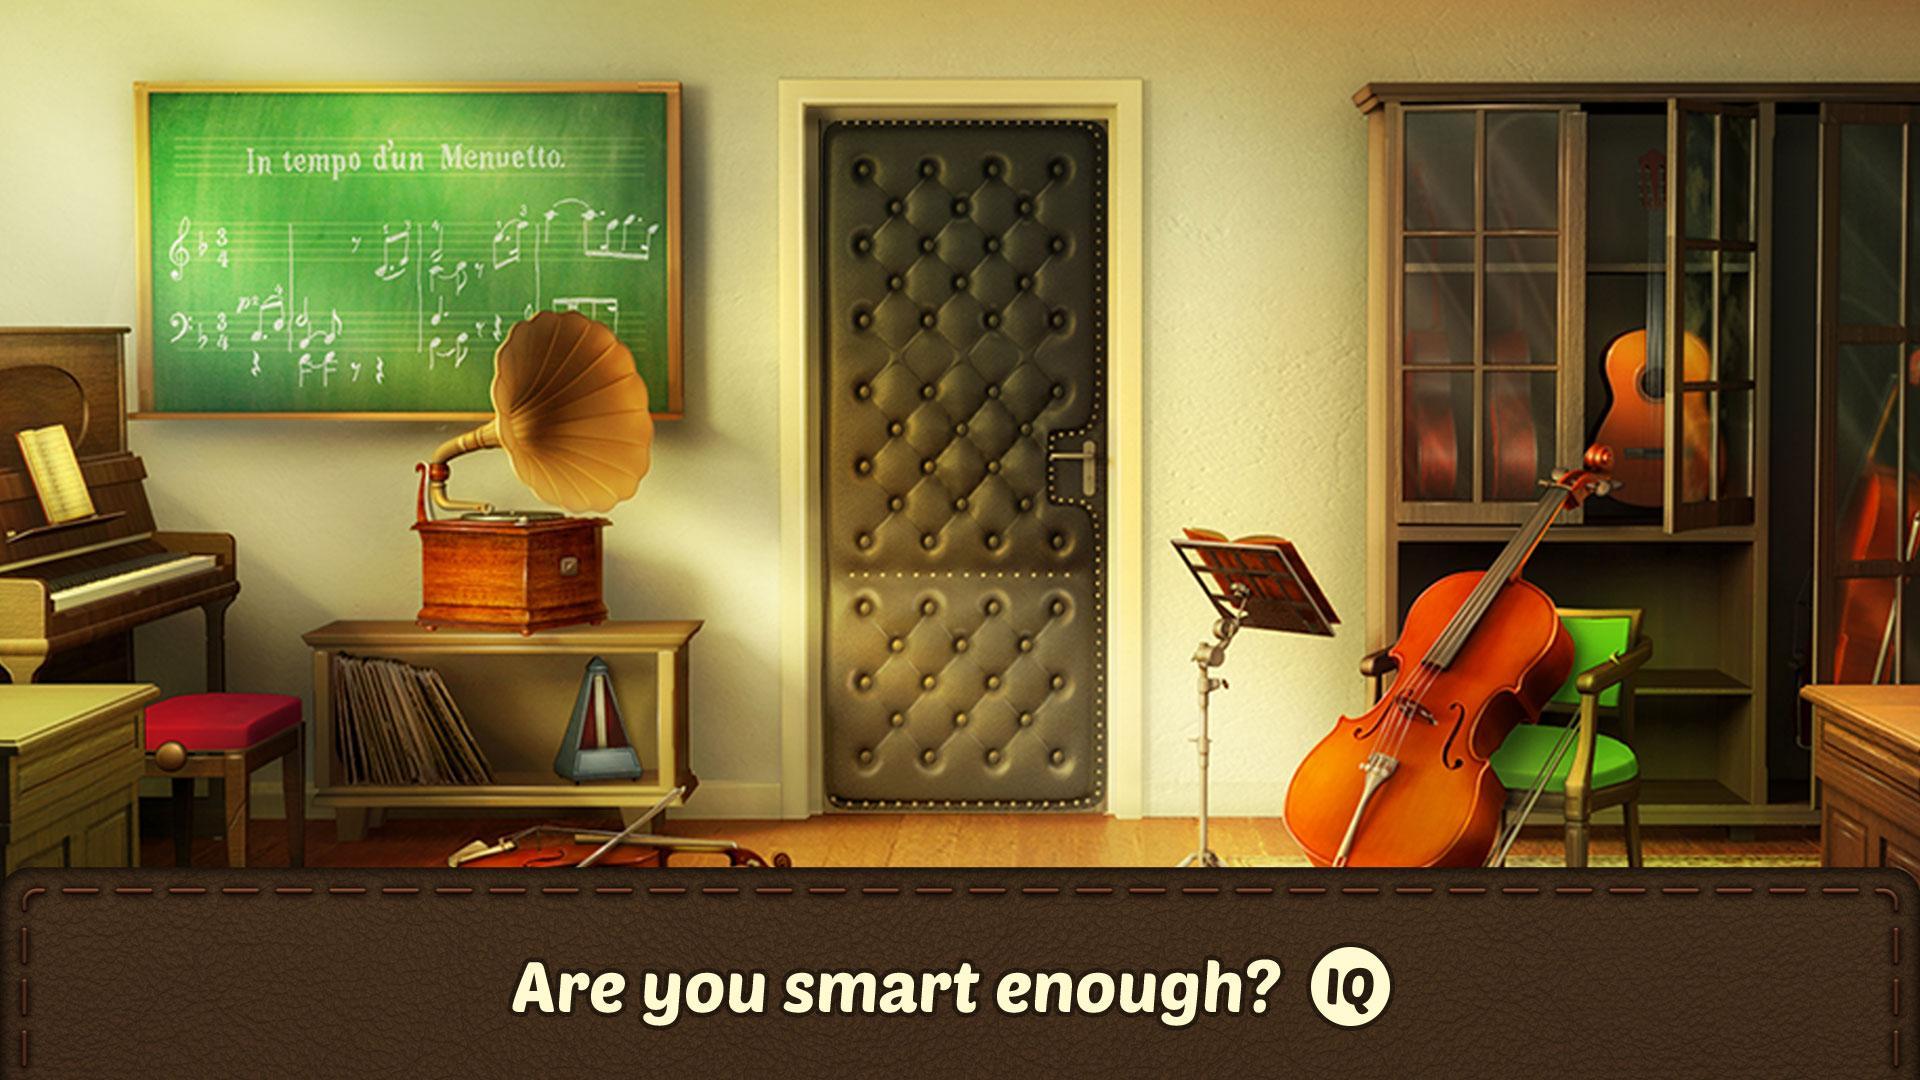 100 Doors Games 2020 Escape From School Apk 3 6 0 Download For Android Download 100 Doors Games 2020 Escape From School Apk Latest Version Apkfab Com